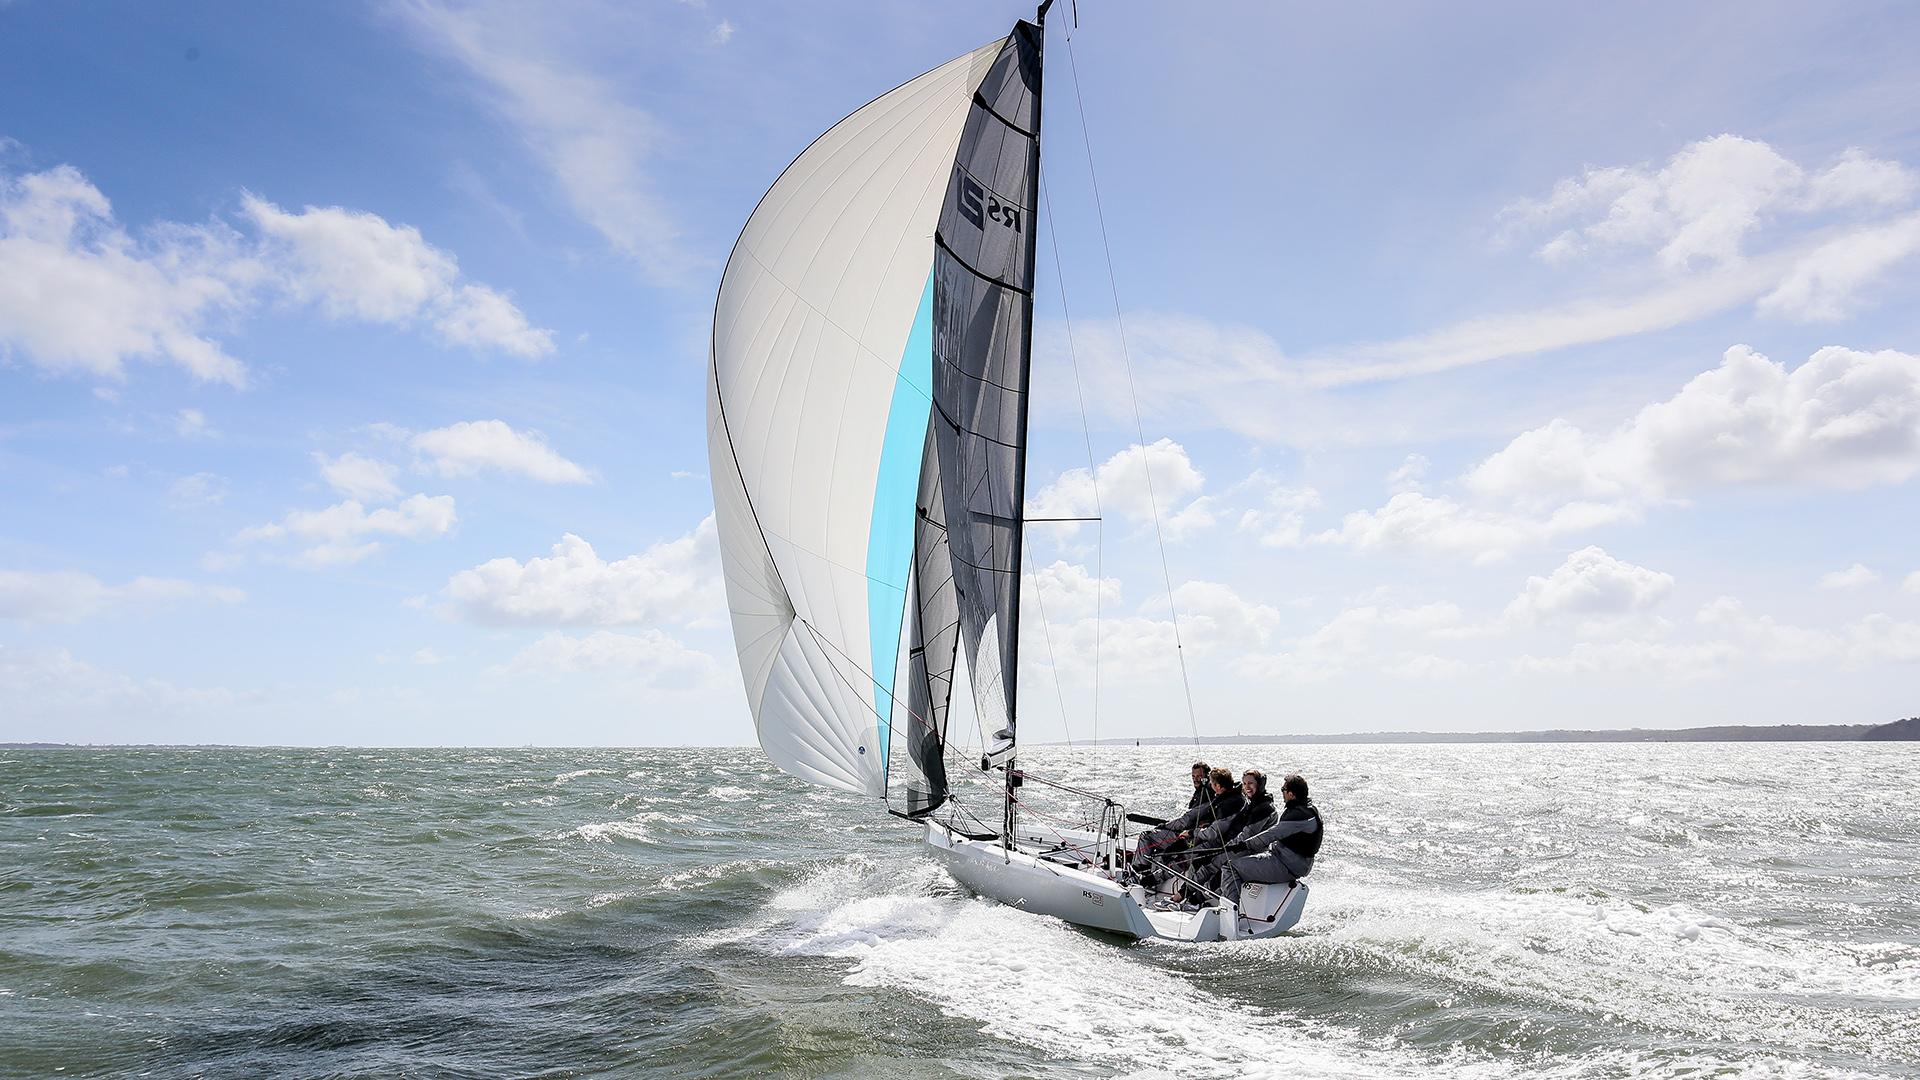 RS 21 Central Coast Sailing 16.jpg